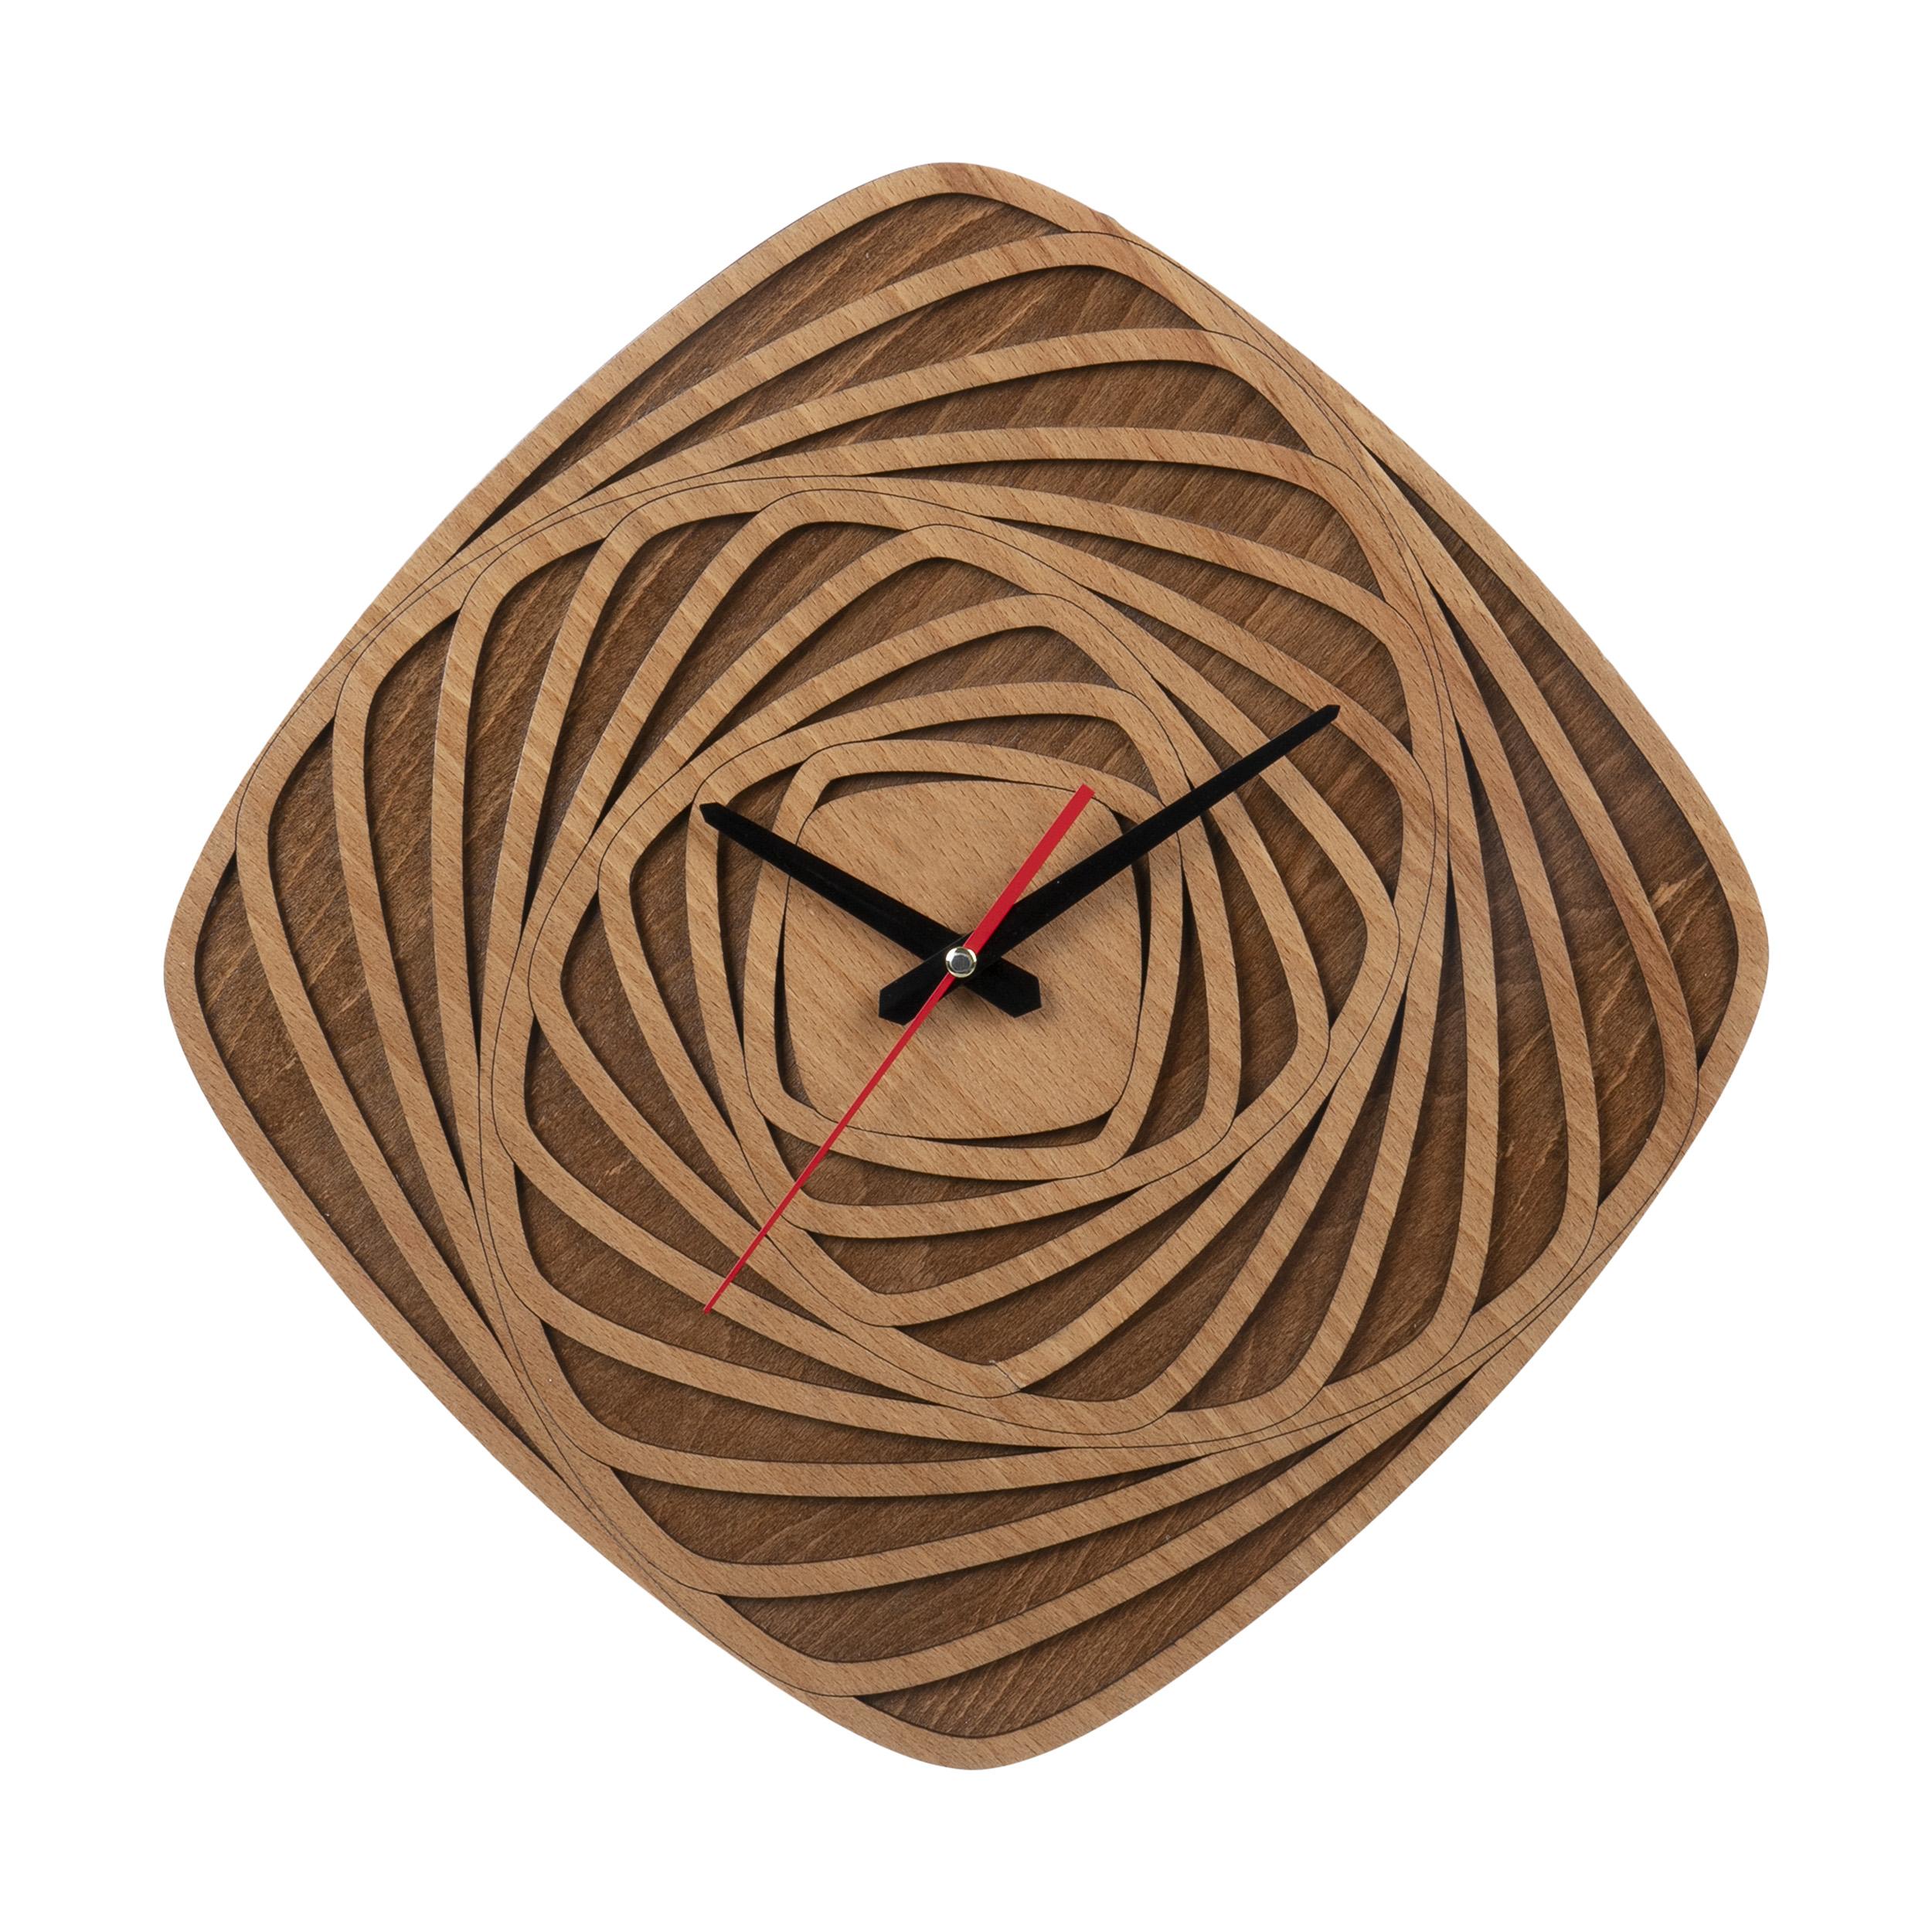 ساعت دیواری معرق کاری هُم آدیس مدل KITA کد CK 607-C